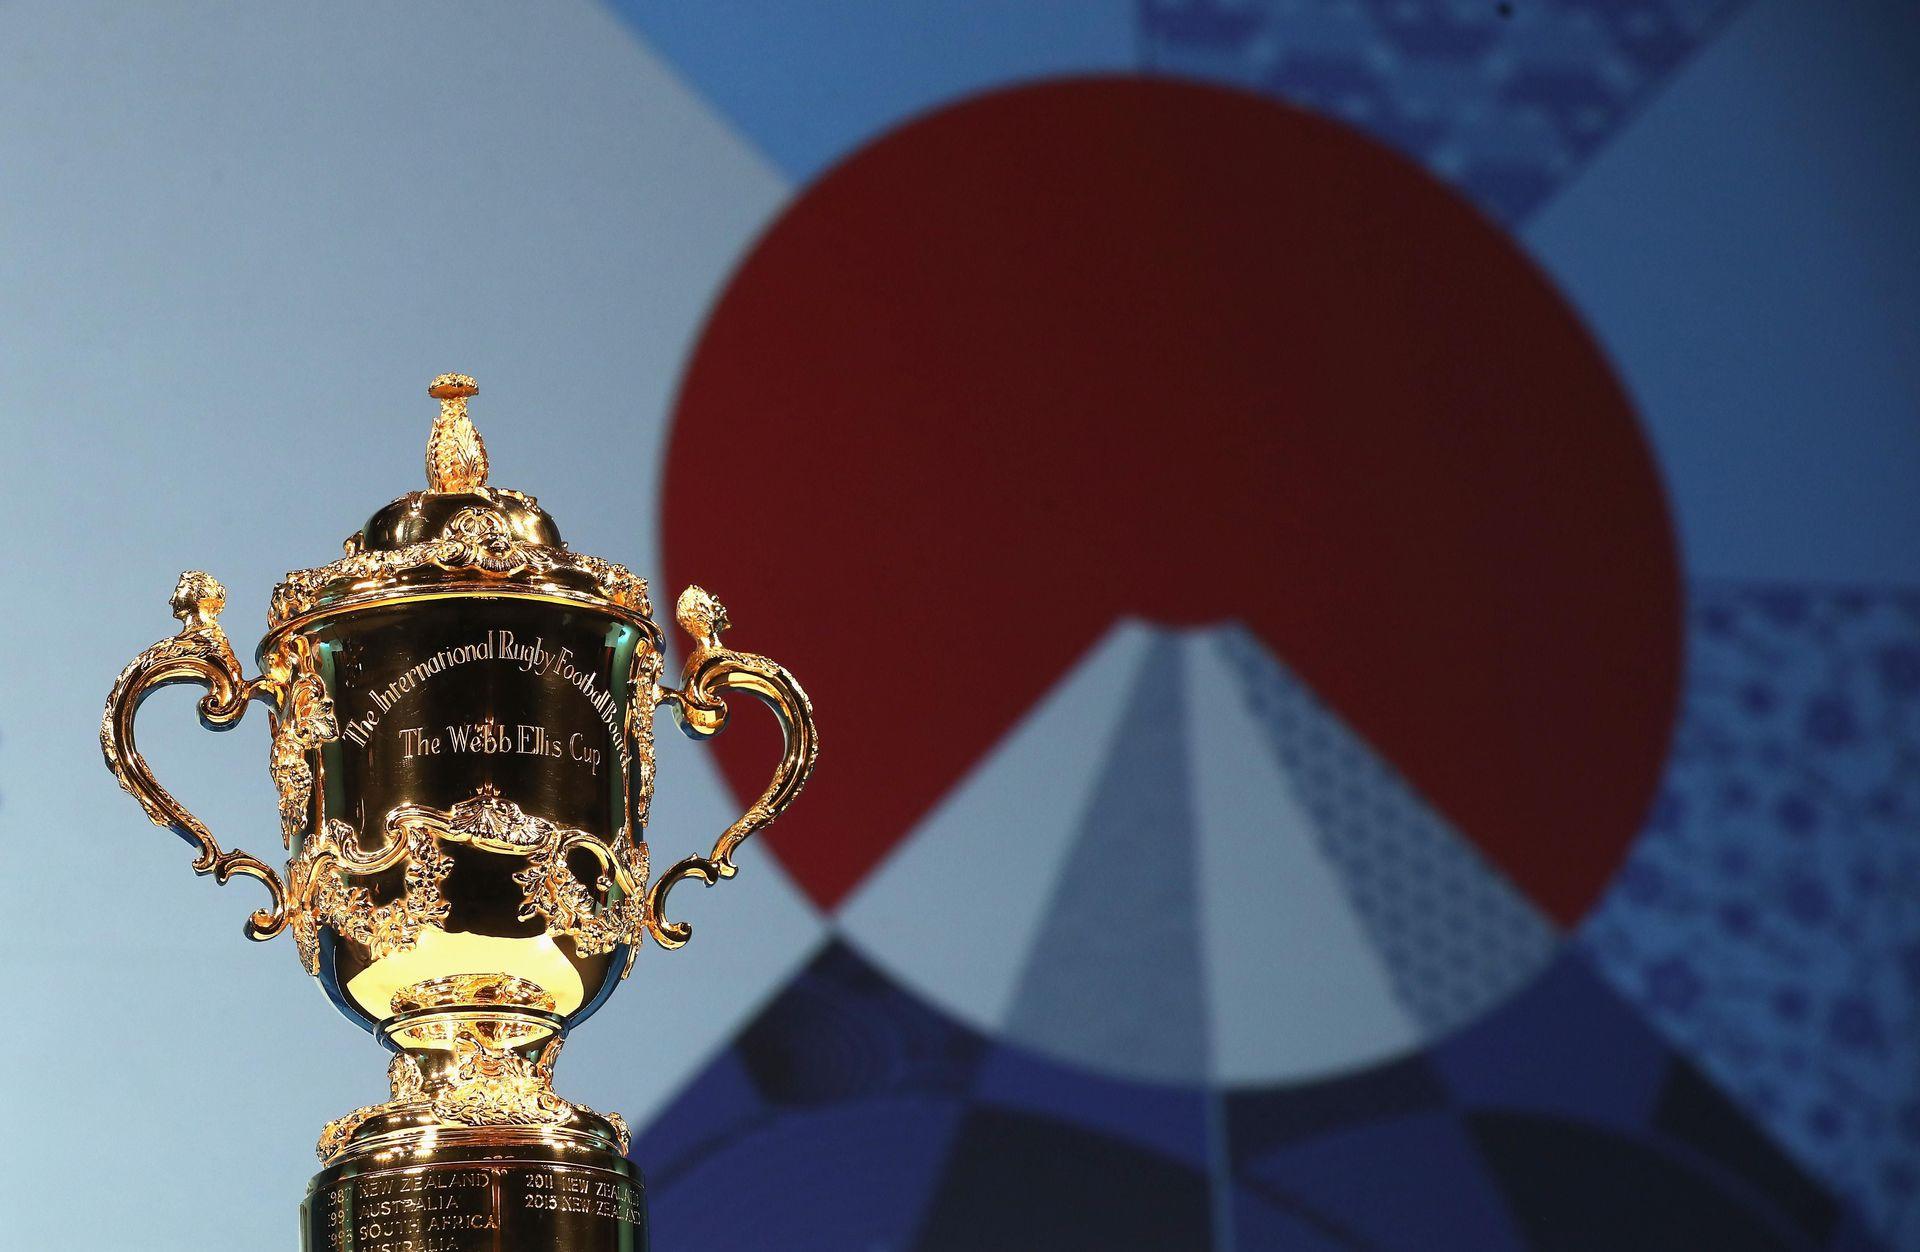 Два матча чемпионата мира отменены из-за тайфуна